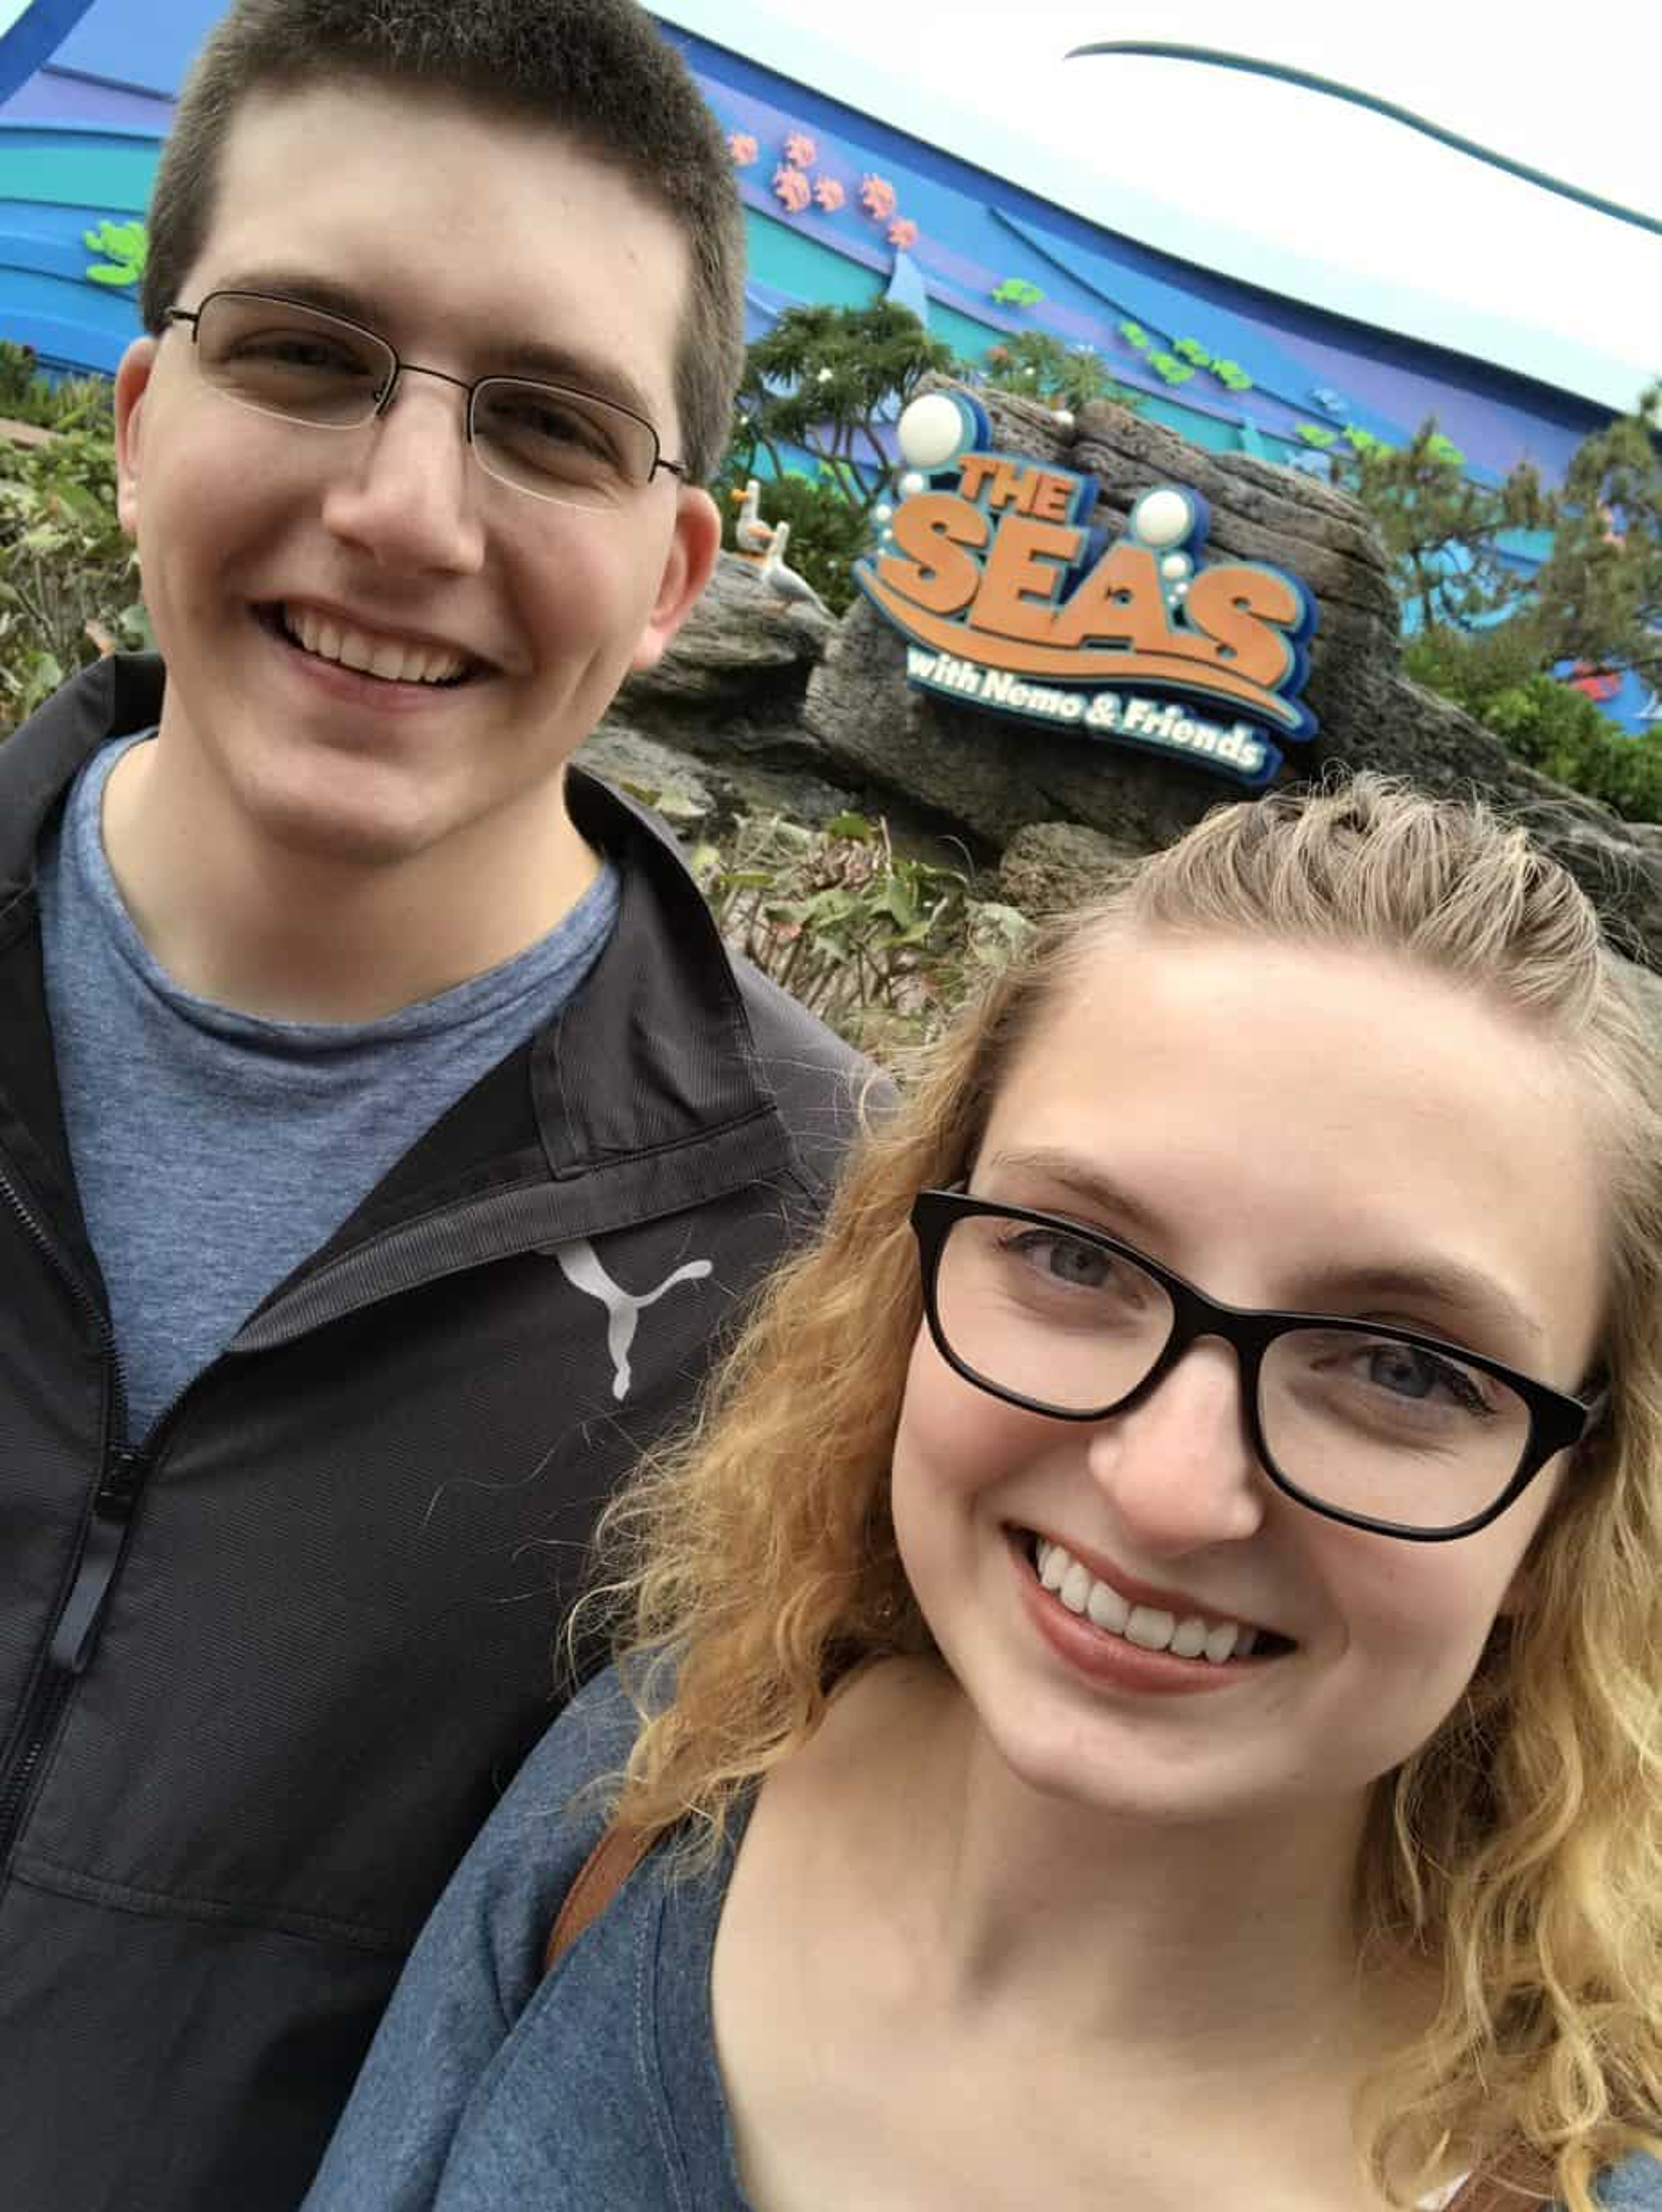 Pre-engagement Selfie at the Seas